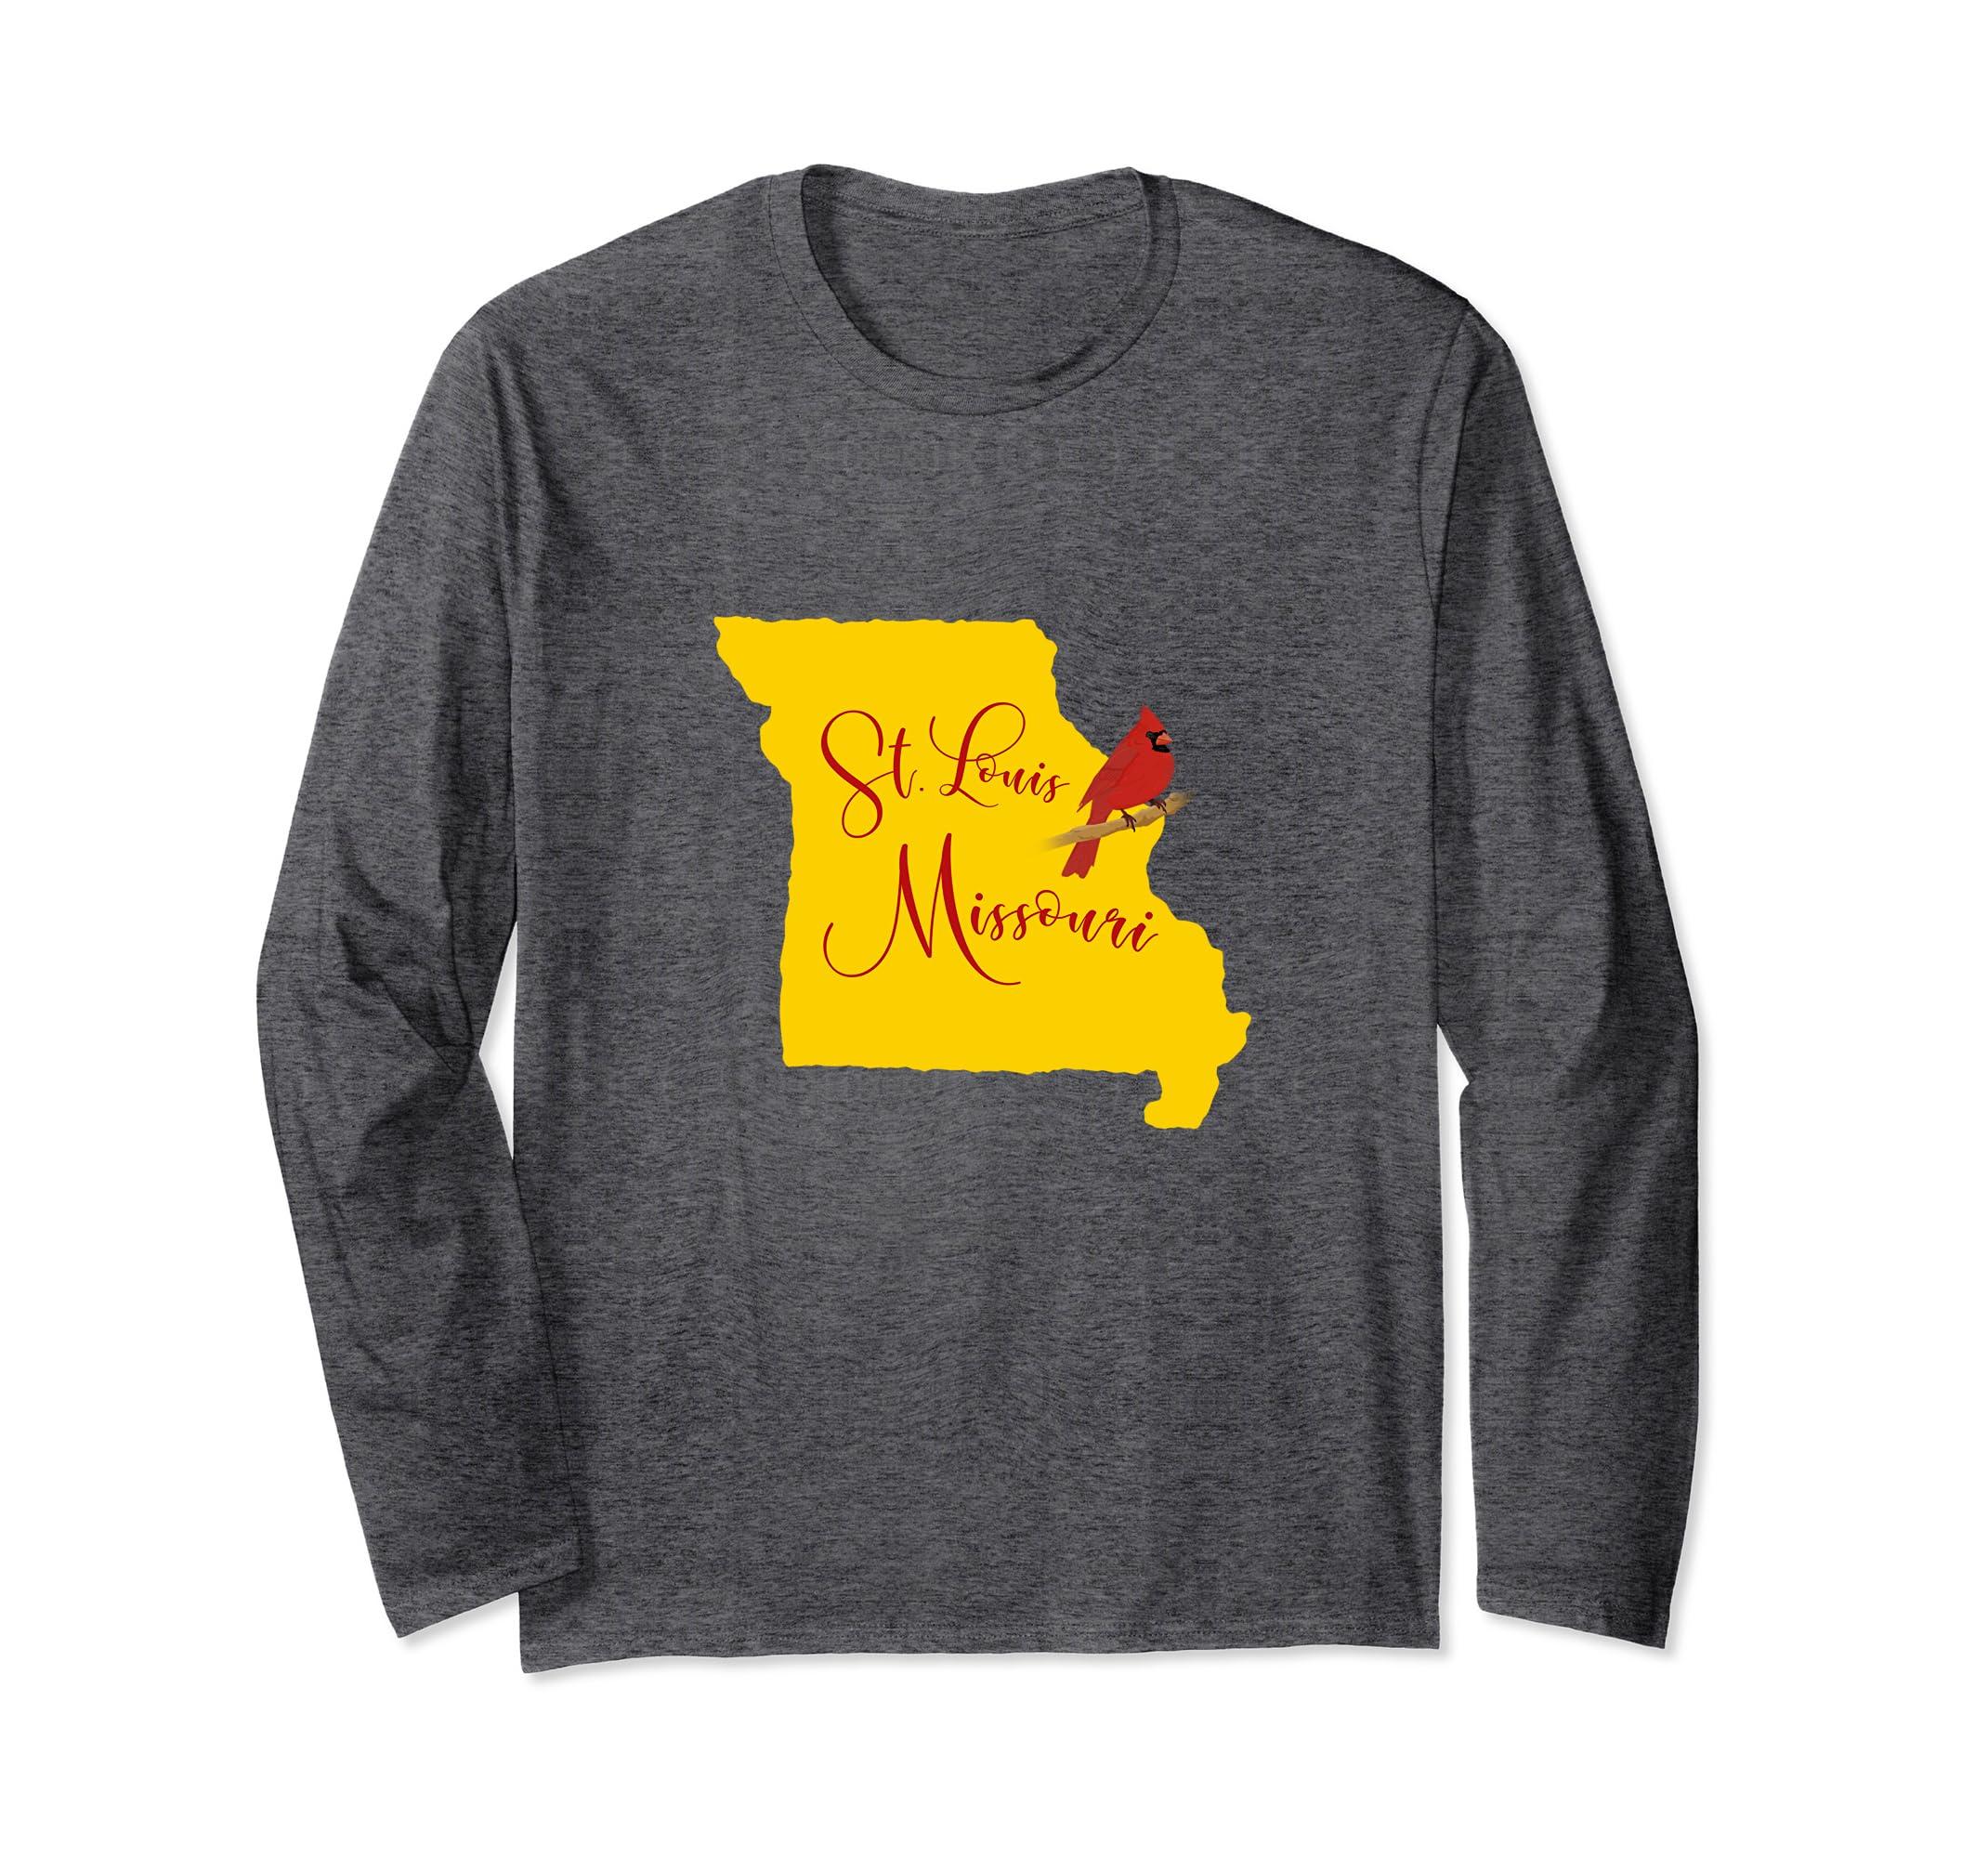 Yellow St. Louis Missouri Red Cardinal Long Sleeve-Bawle